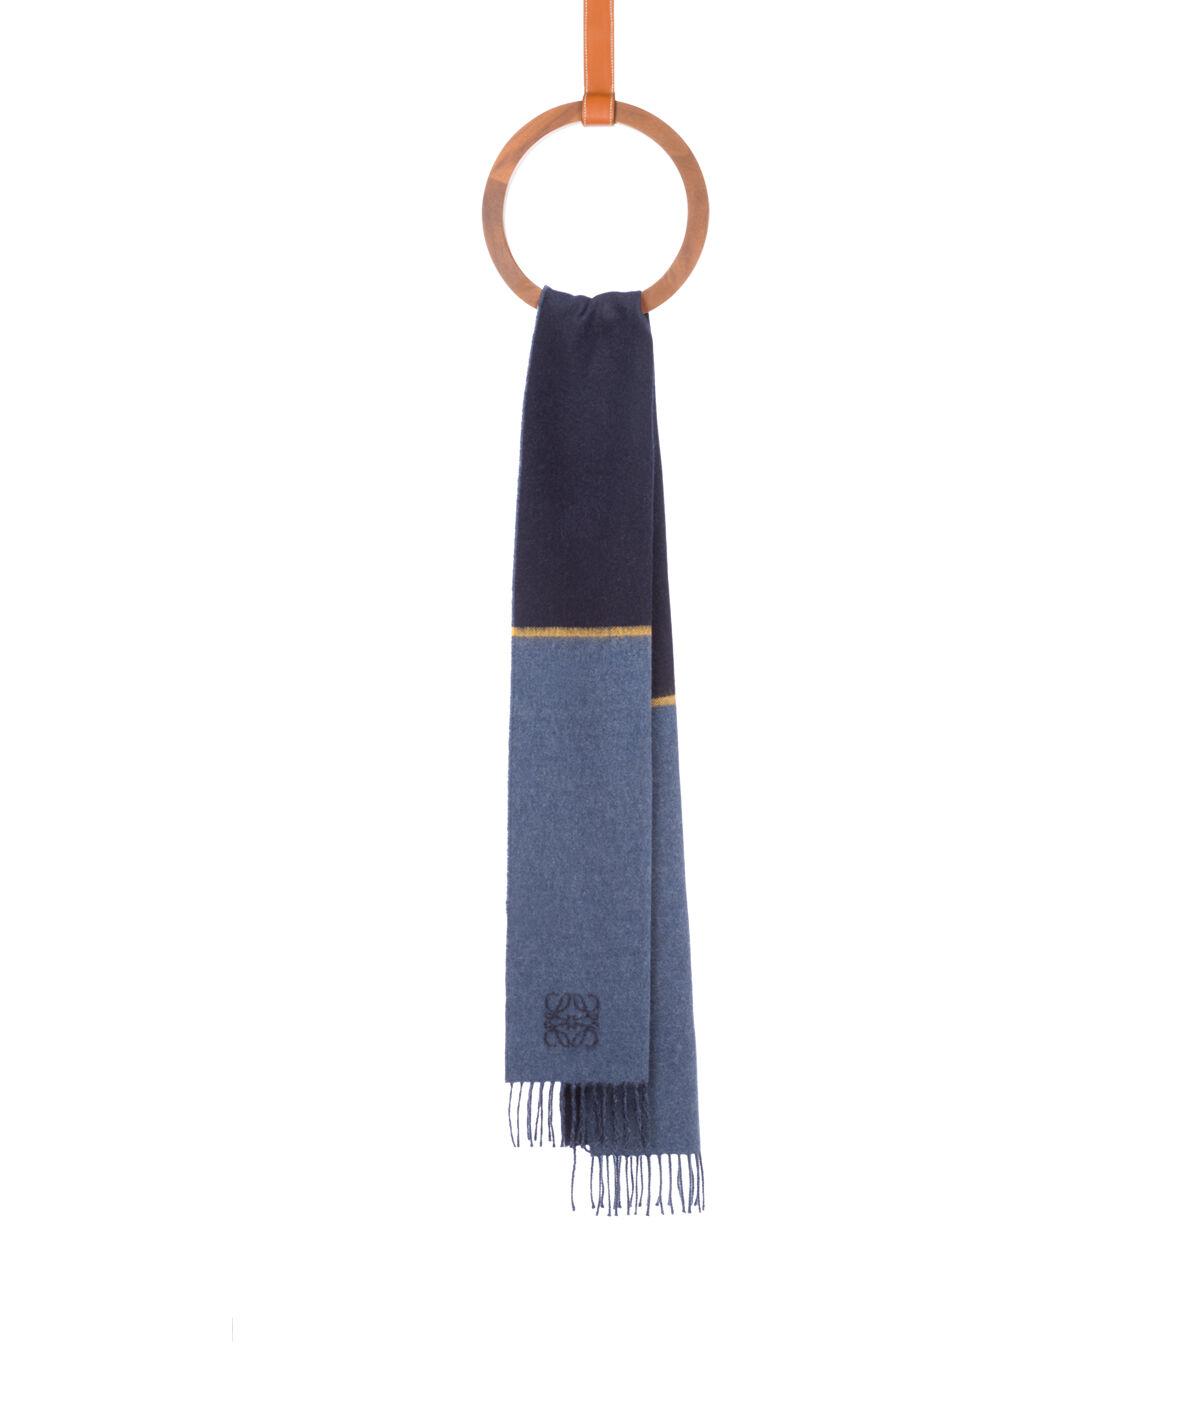 LOEWE 30X180 ウィンドウ スカーフ ストライプ yellow/blue all